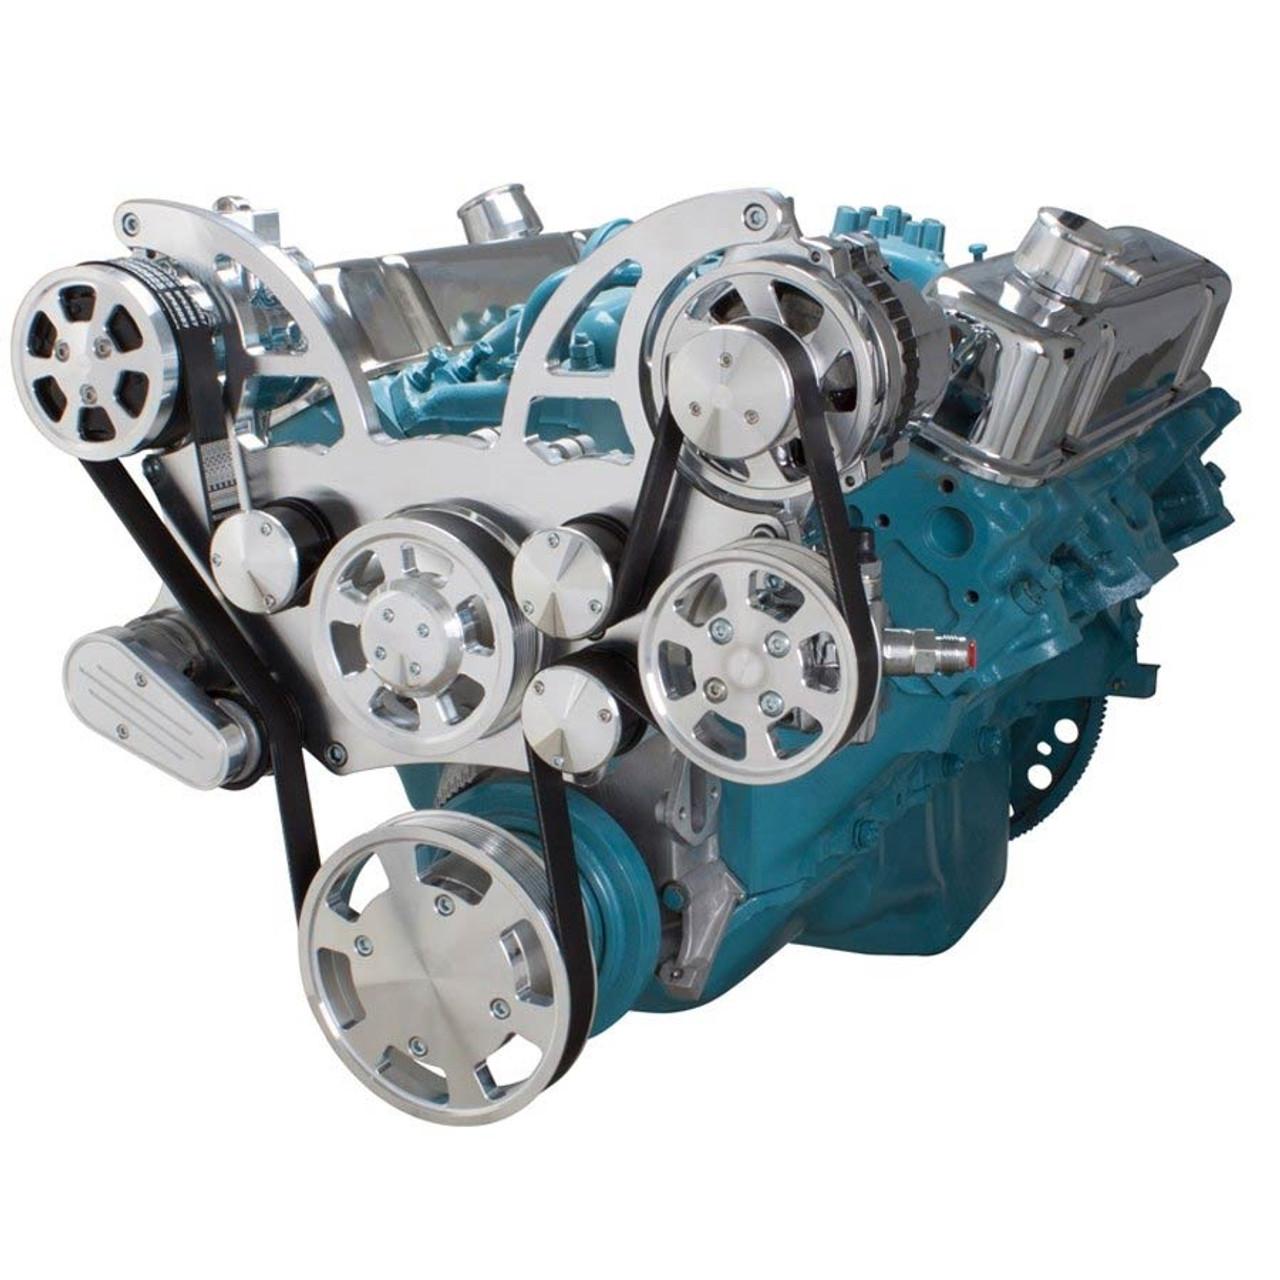 Serpentine Conversion Kit For Pontiac 350 400 428 455 V8 Engines Steering Bolt Power Pump System Ac